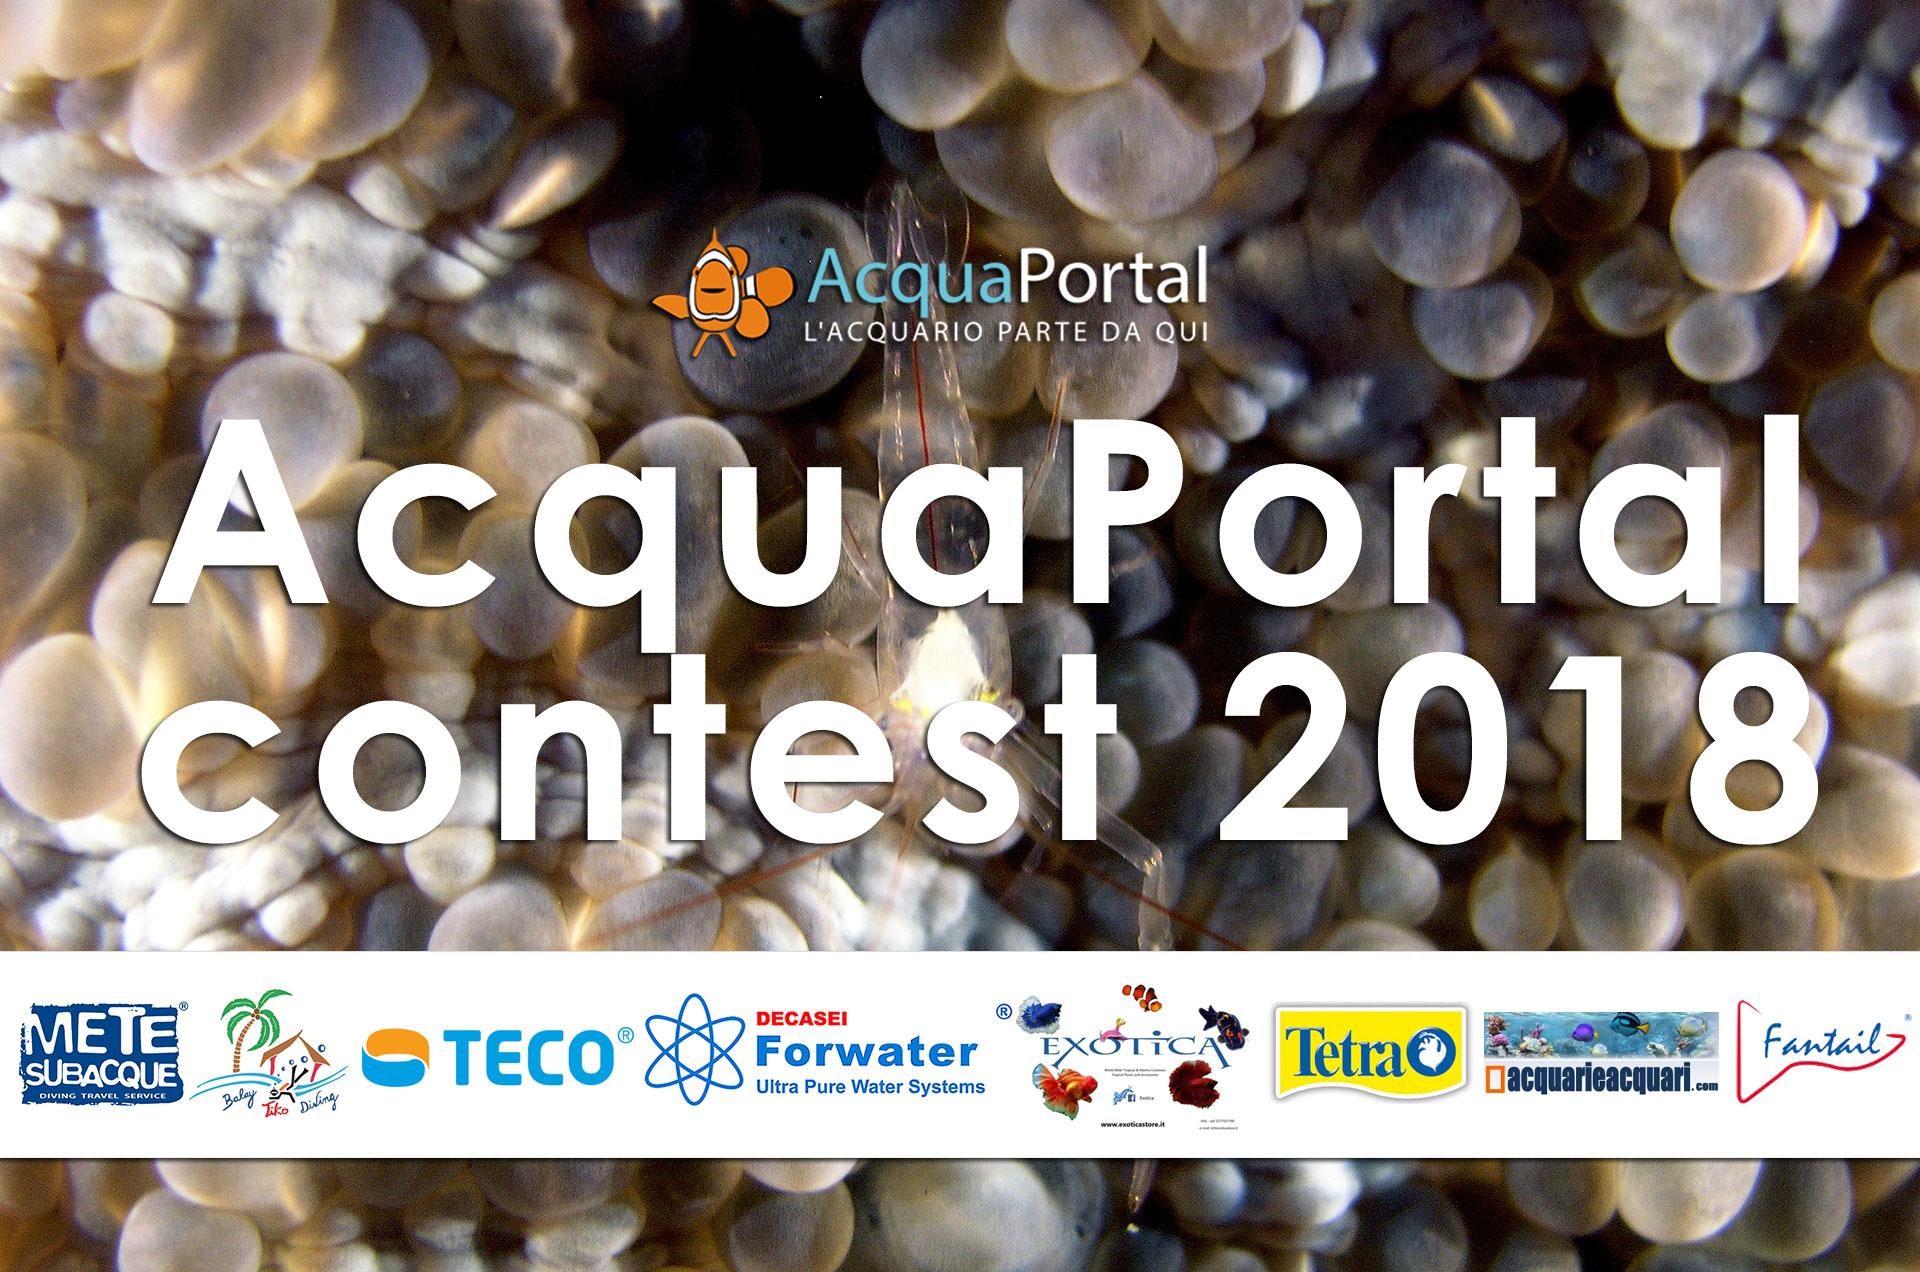 acquaportal contest